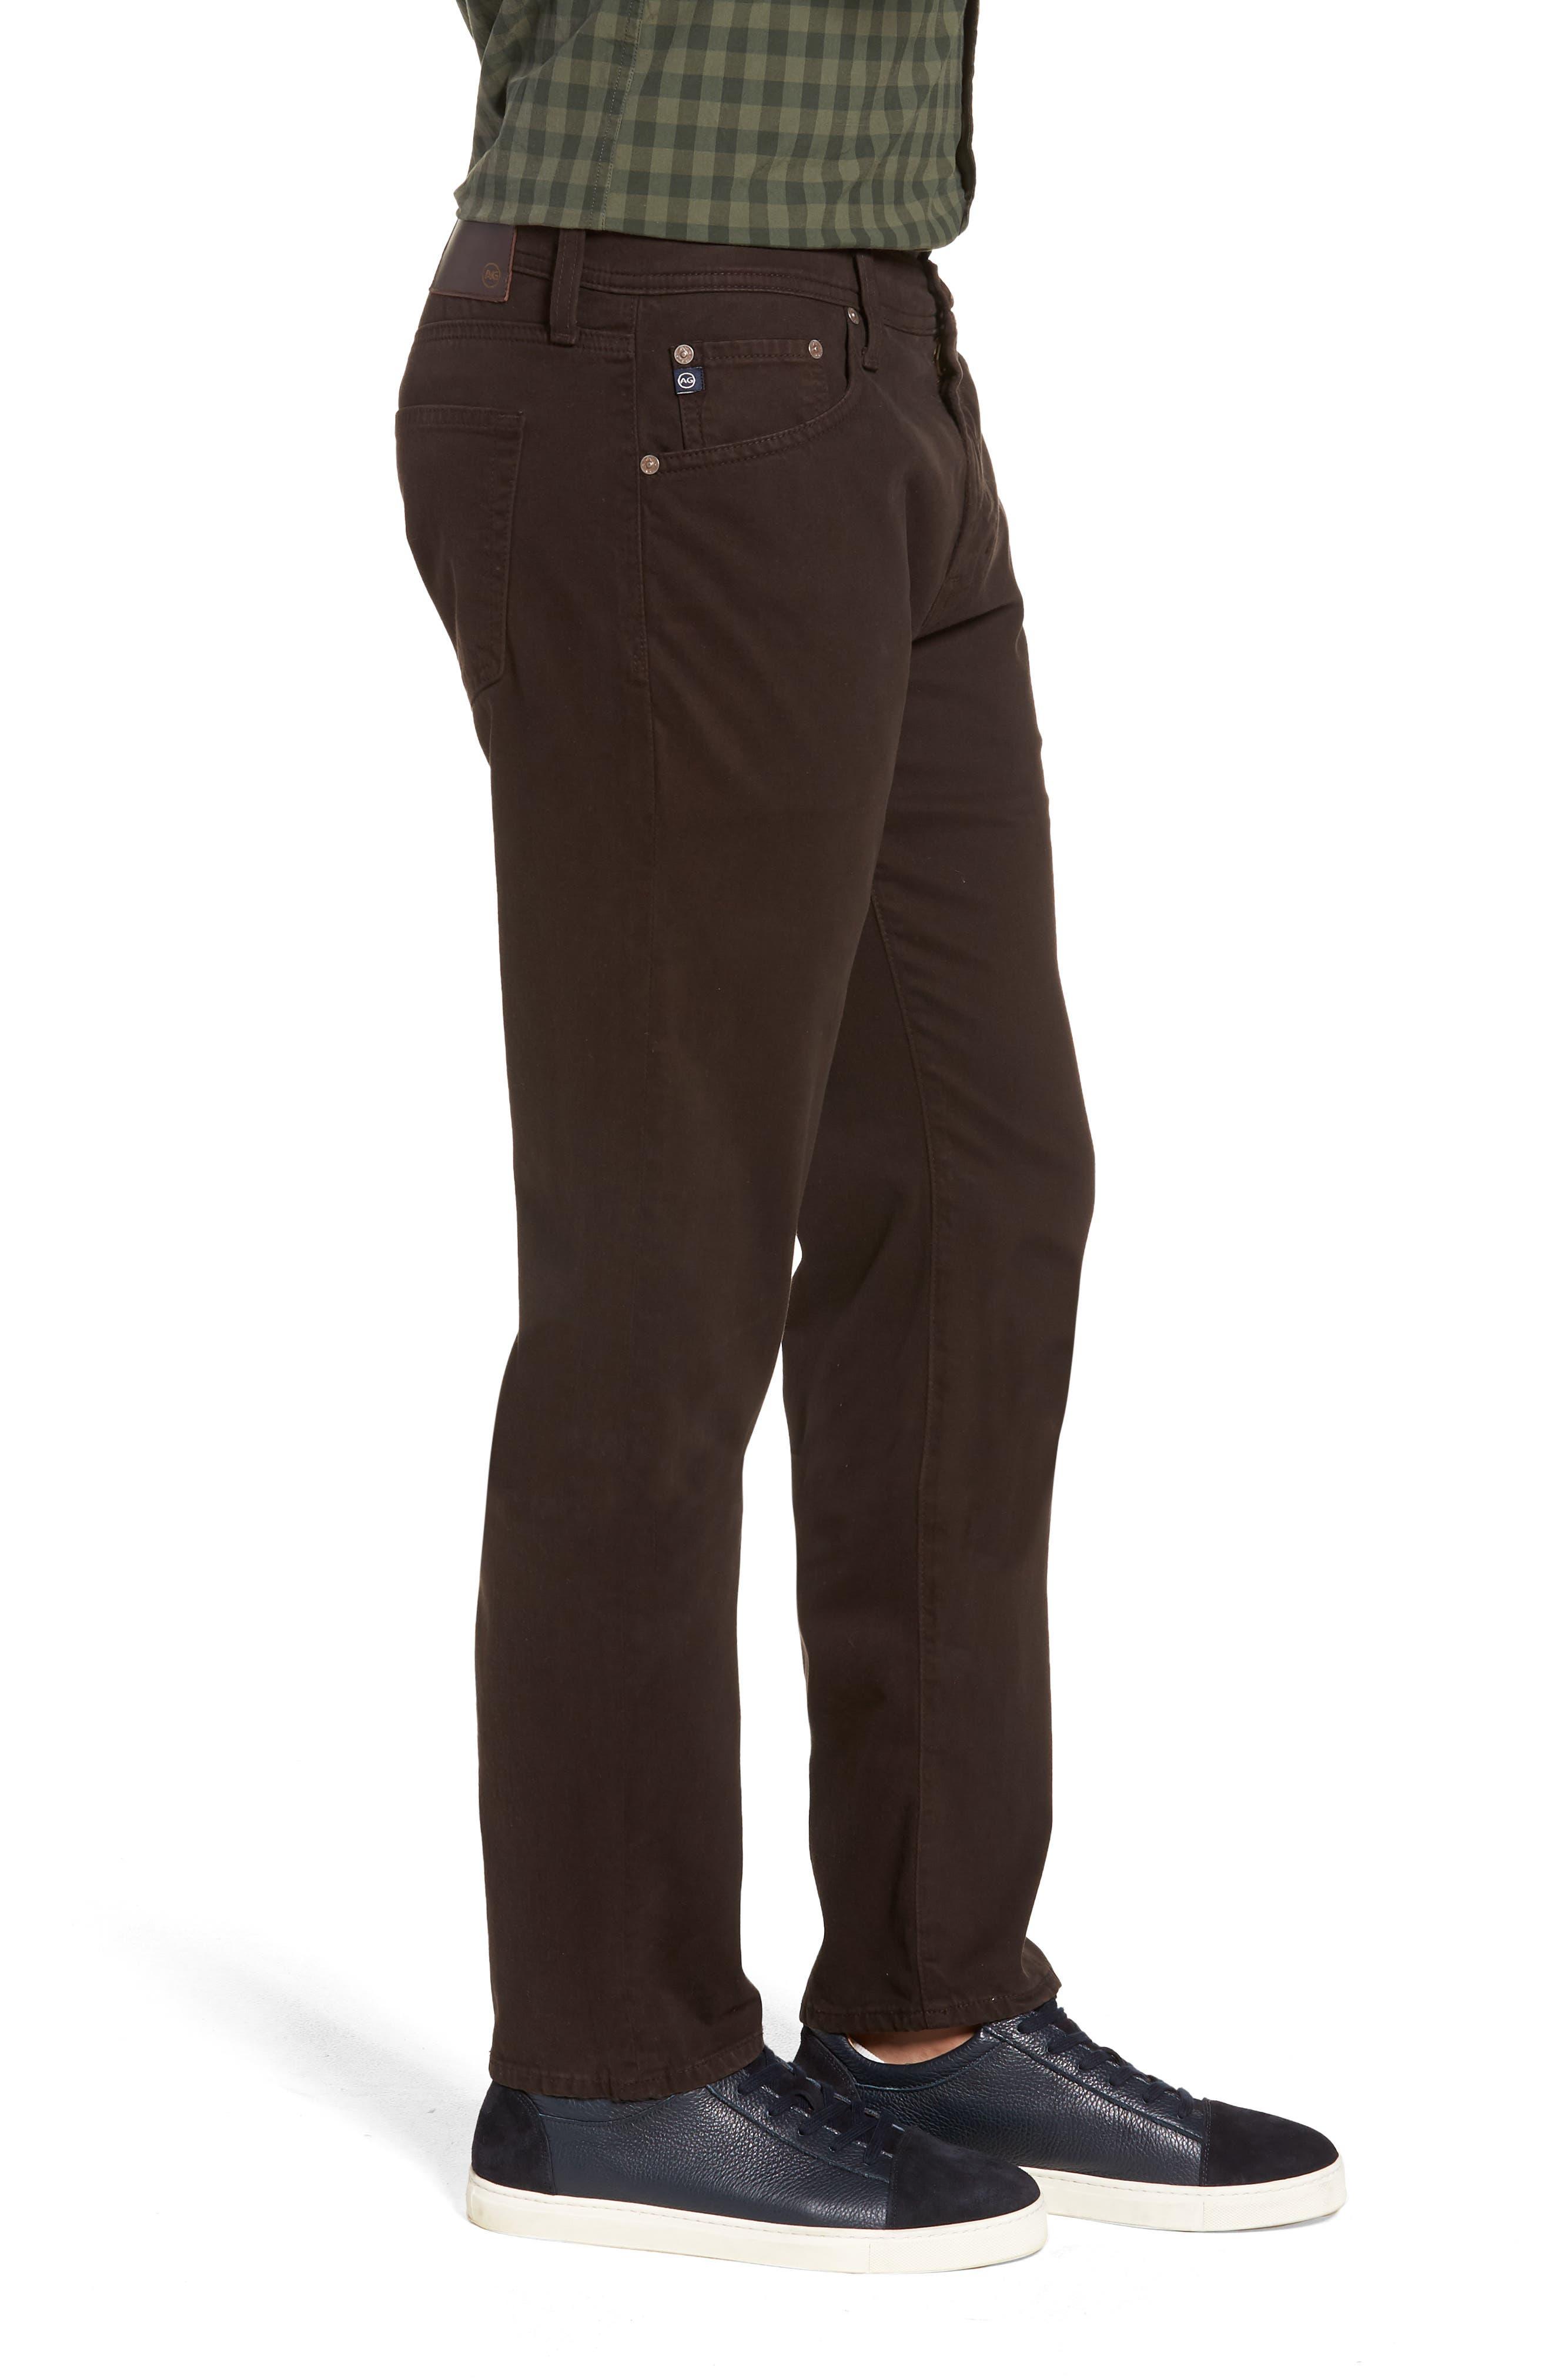 Tellis SUD Modern Slim Stretch Twill Pants,                             Alternate thumbnail 3, color,                             Shutter Brown